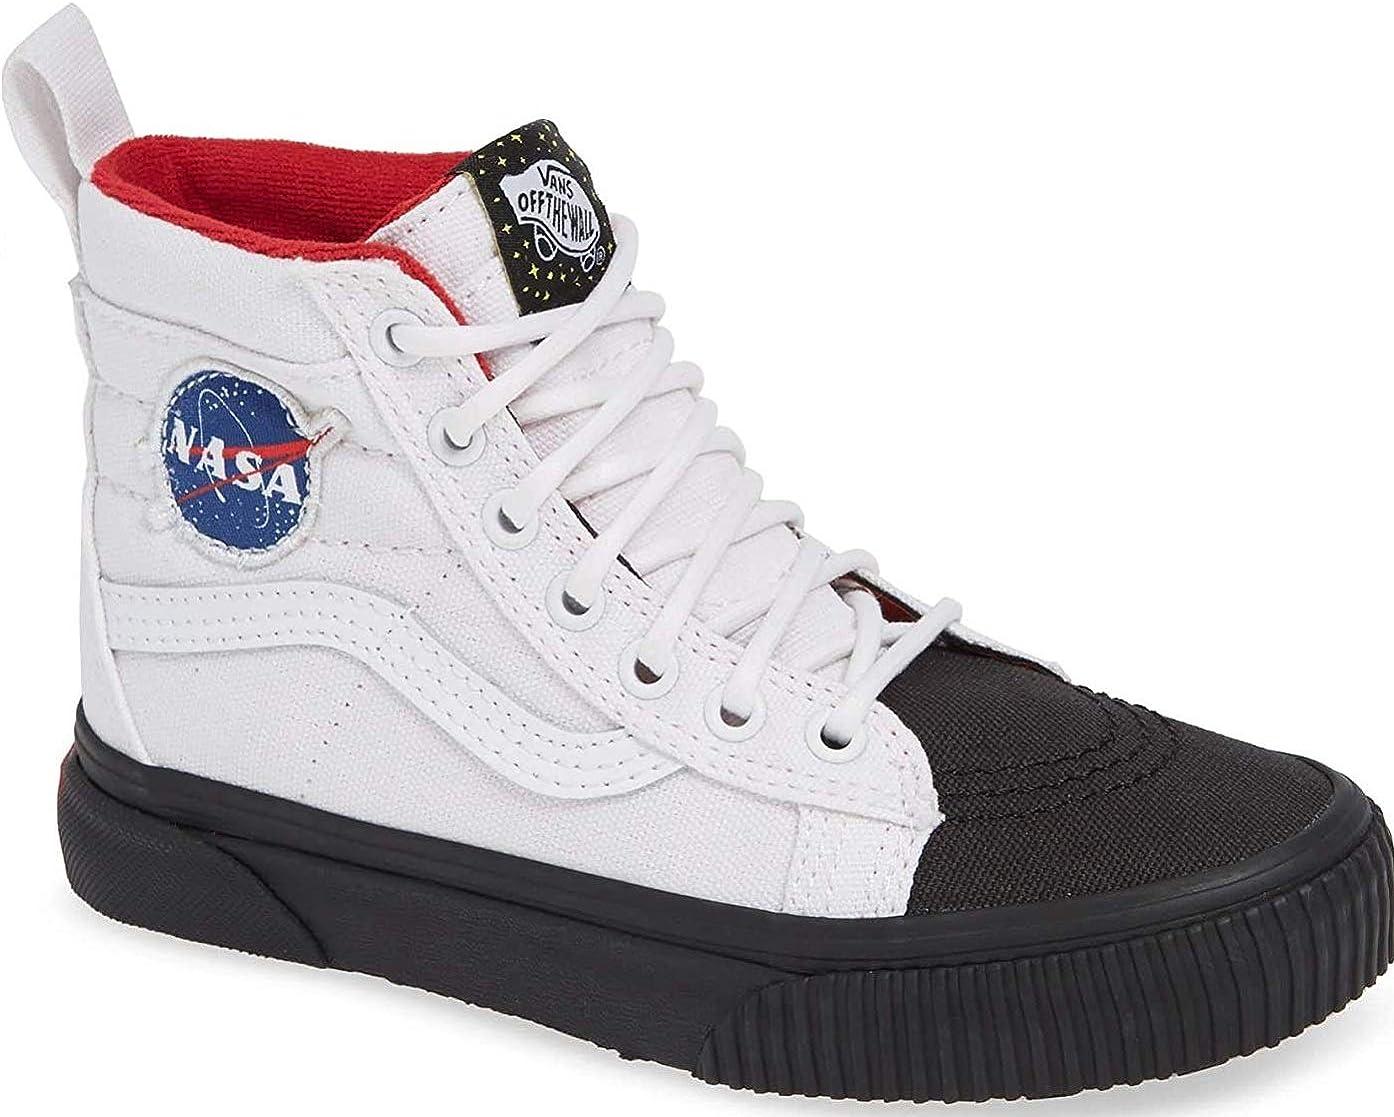 Vans Kids X NASA Space Voyager SK8-Hi